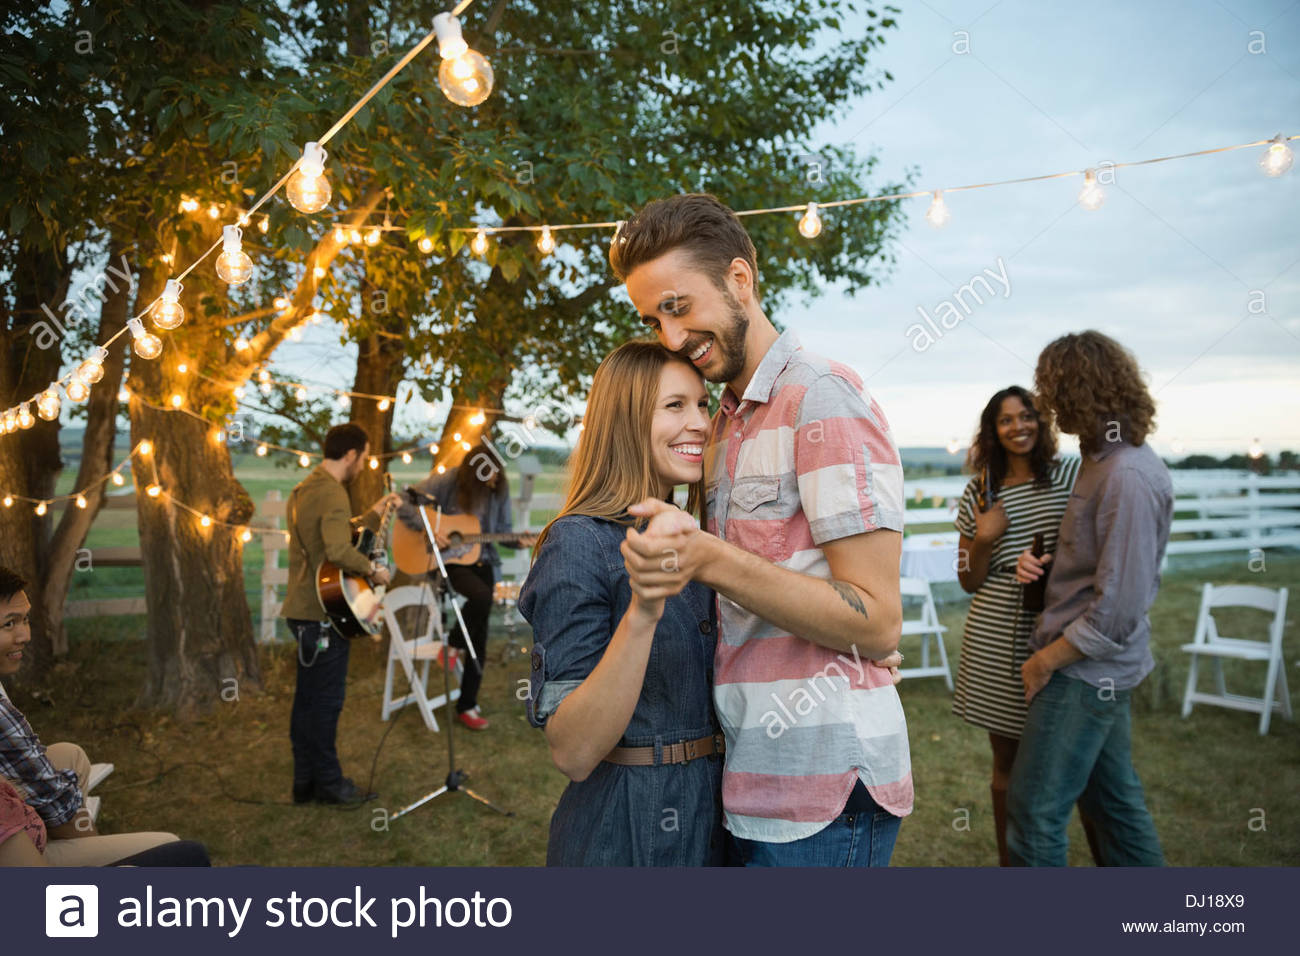 Felice coppia giovane dancing at outdoor farm party Immagini Stock